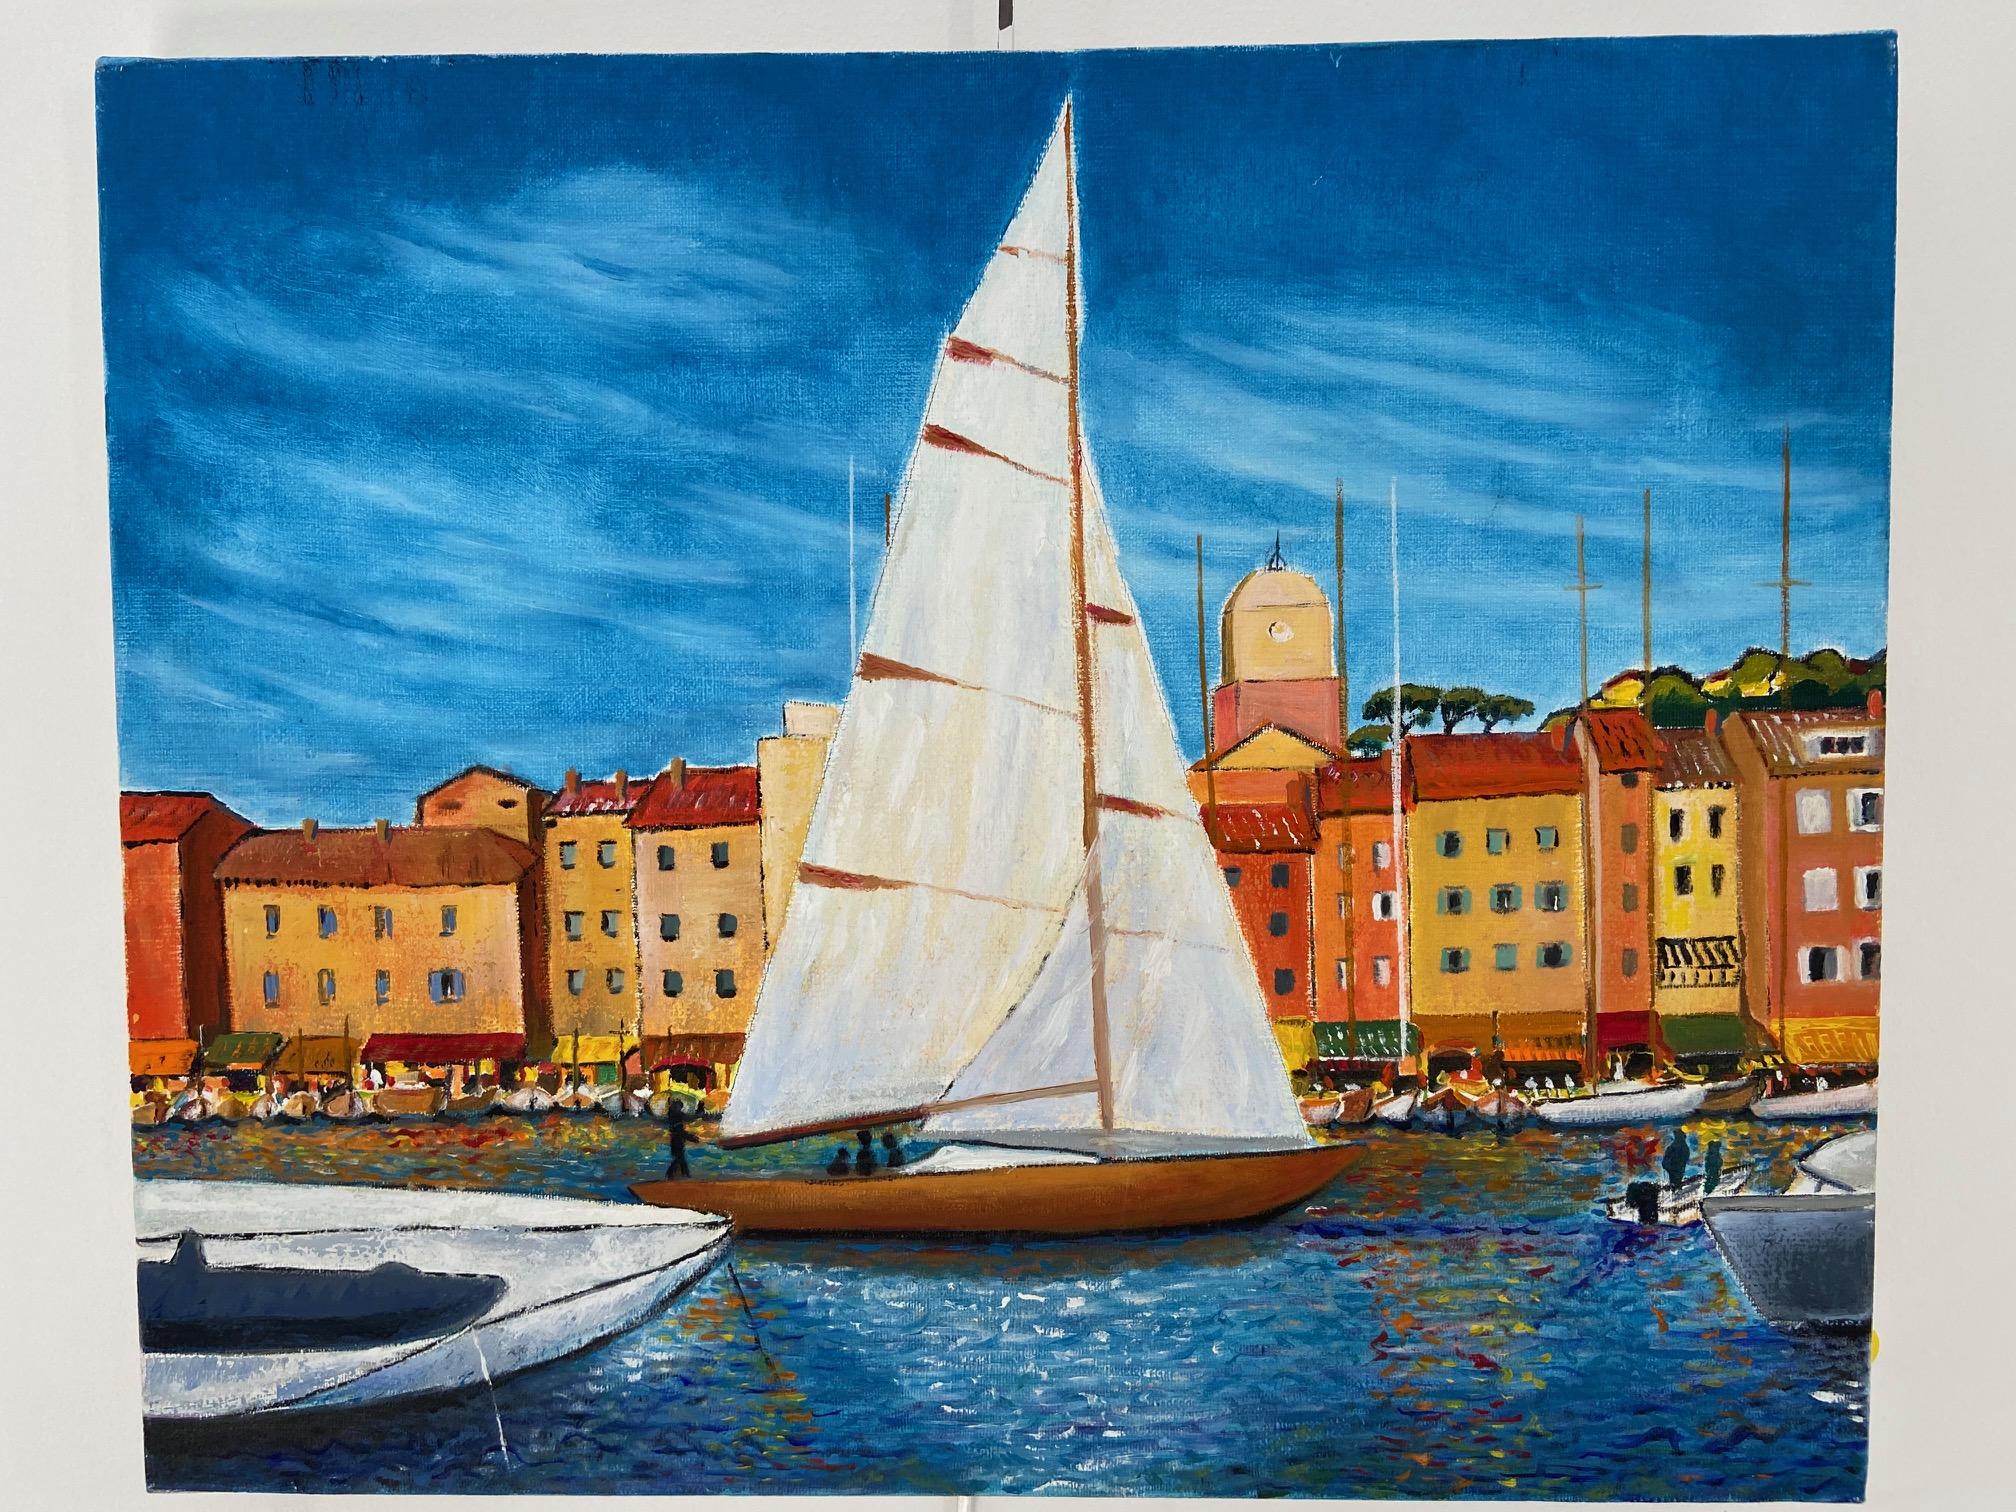 6. Robert Hjelt, St Tropez